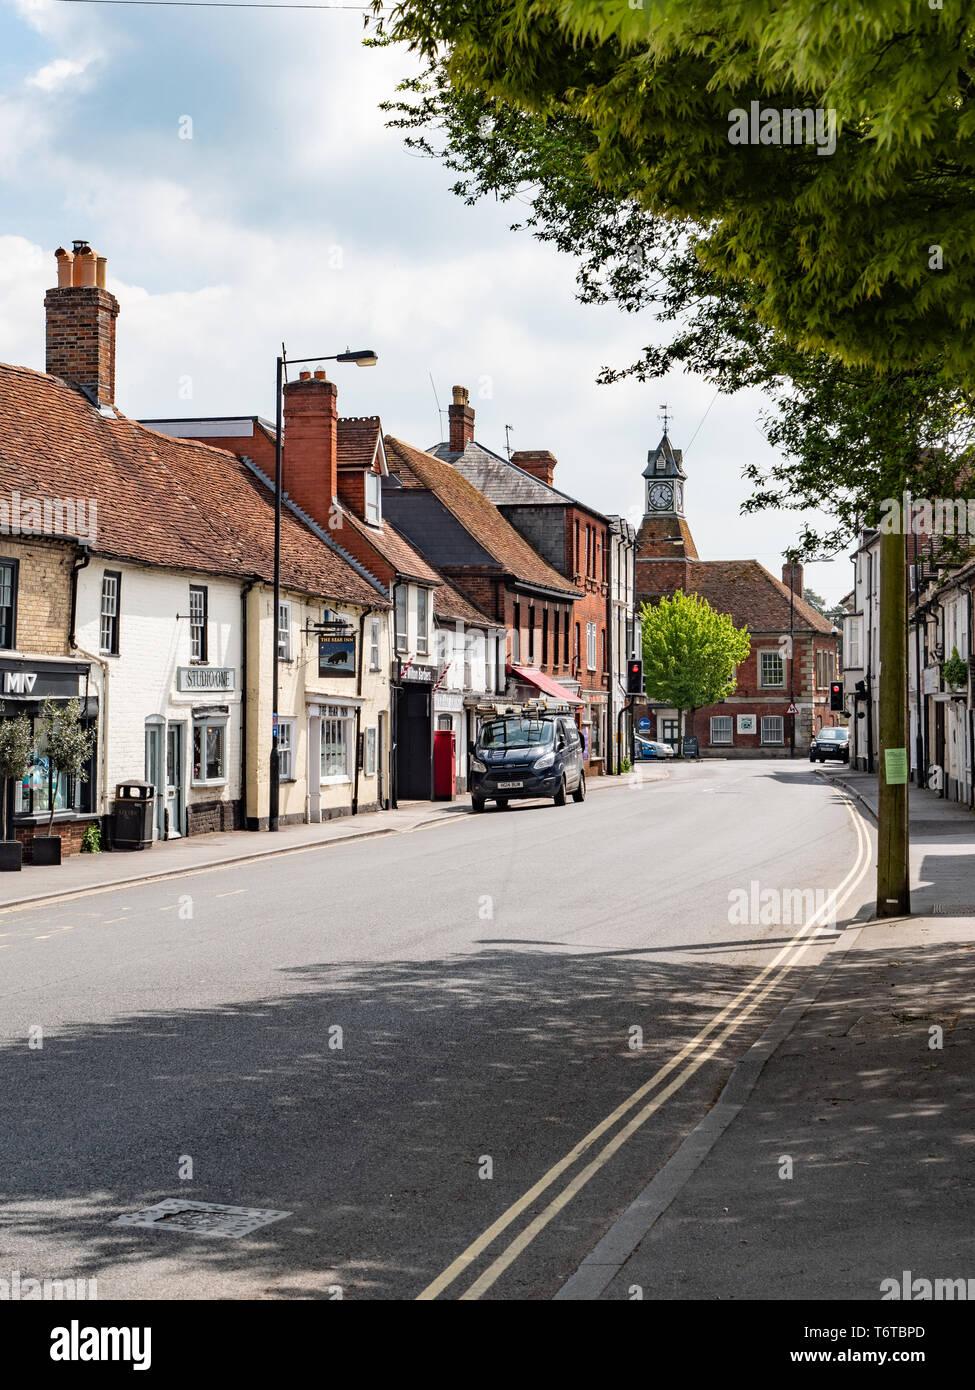 Street view of West Street, Wilton, nr Salisbury, Wiltshire, UK. - Stock Image